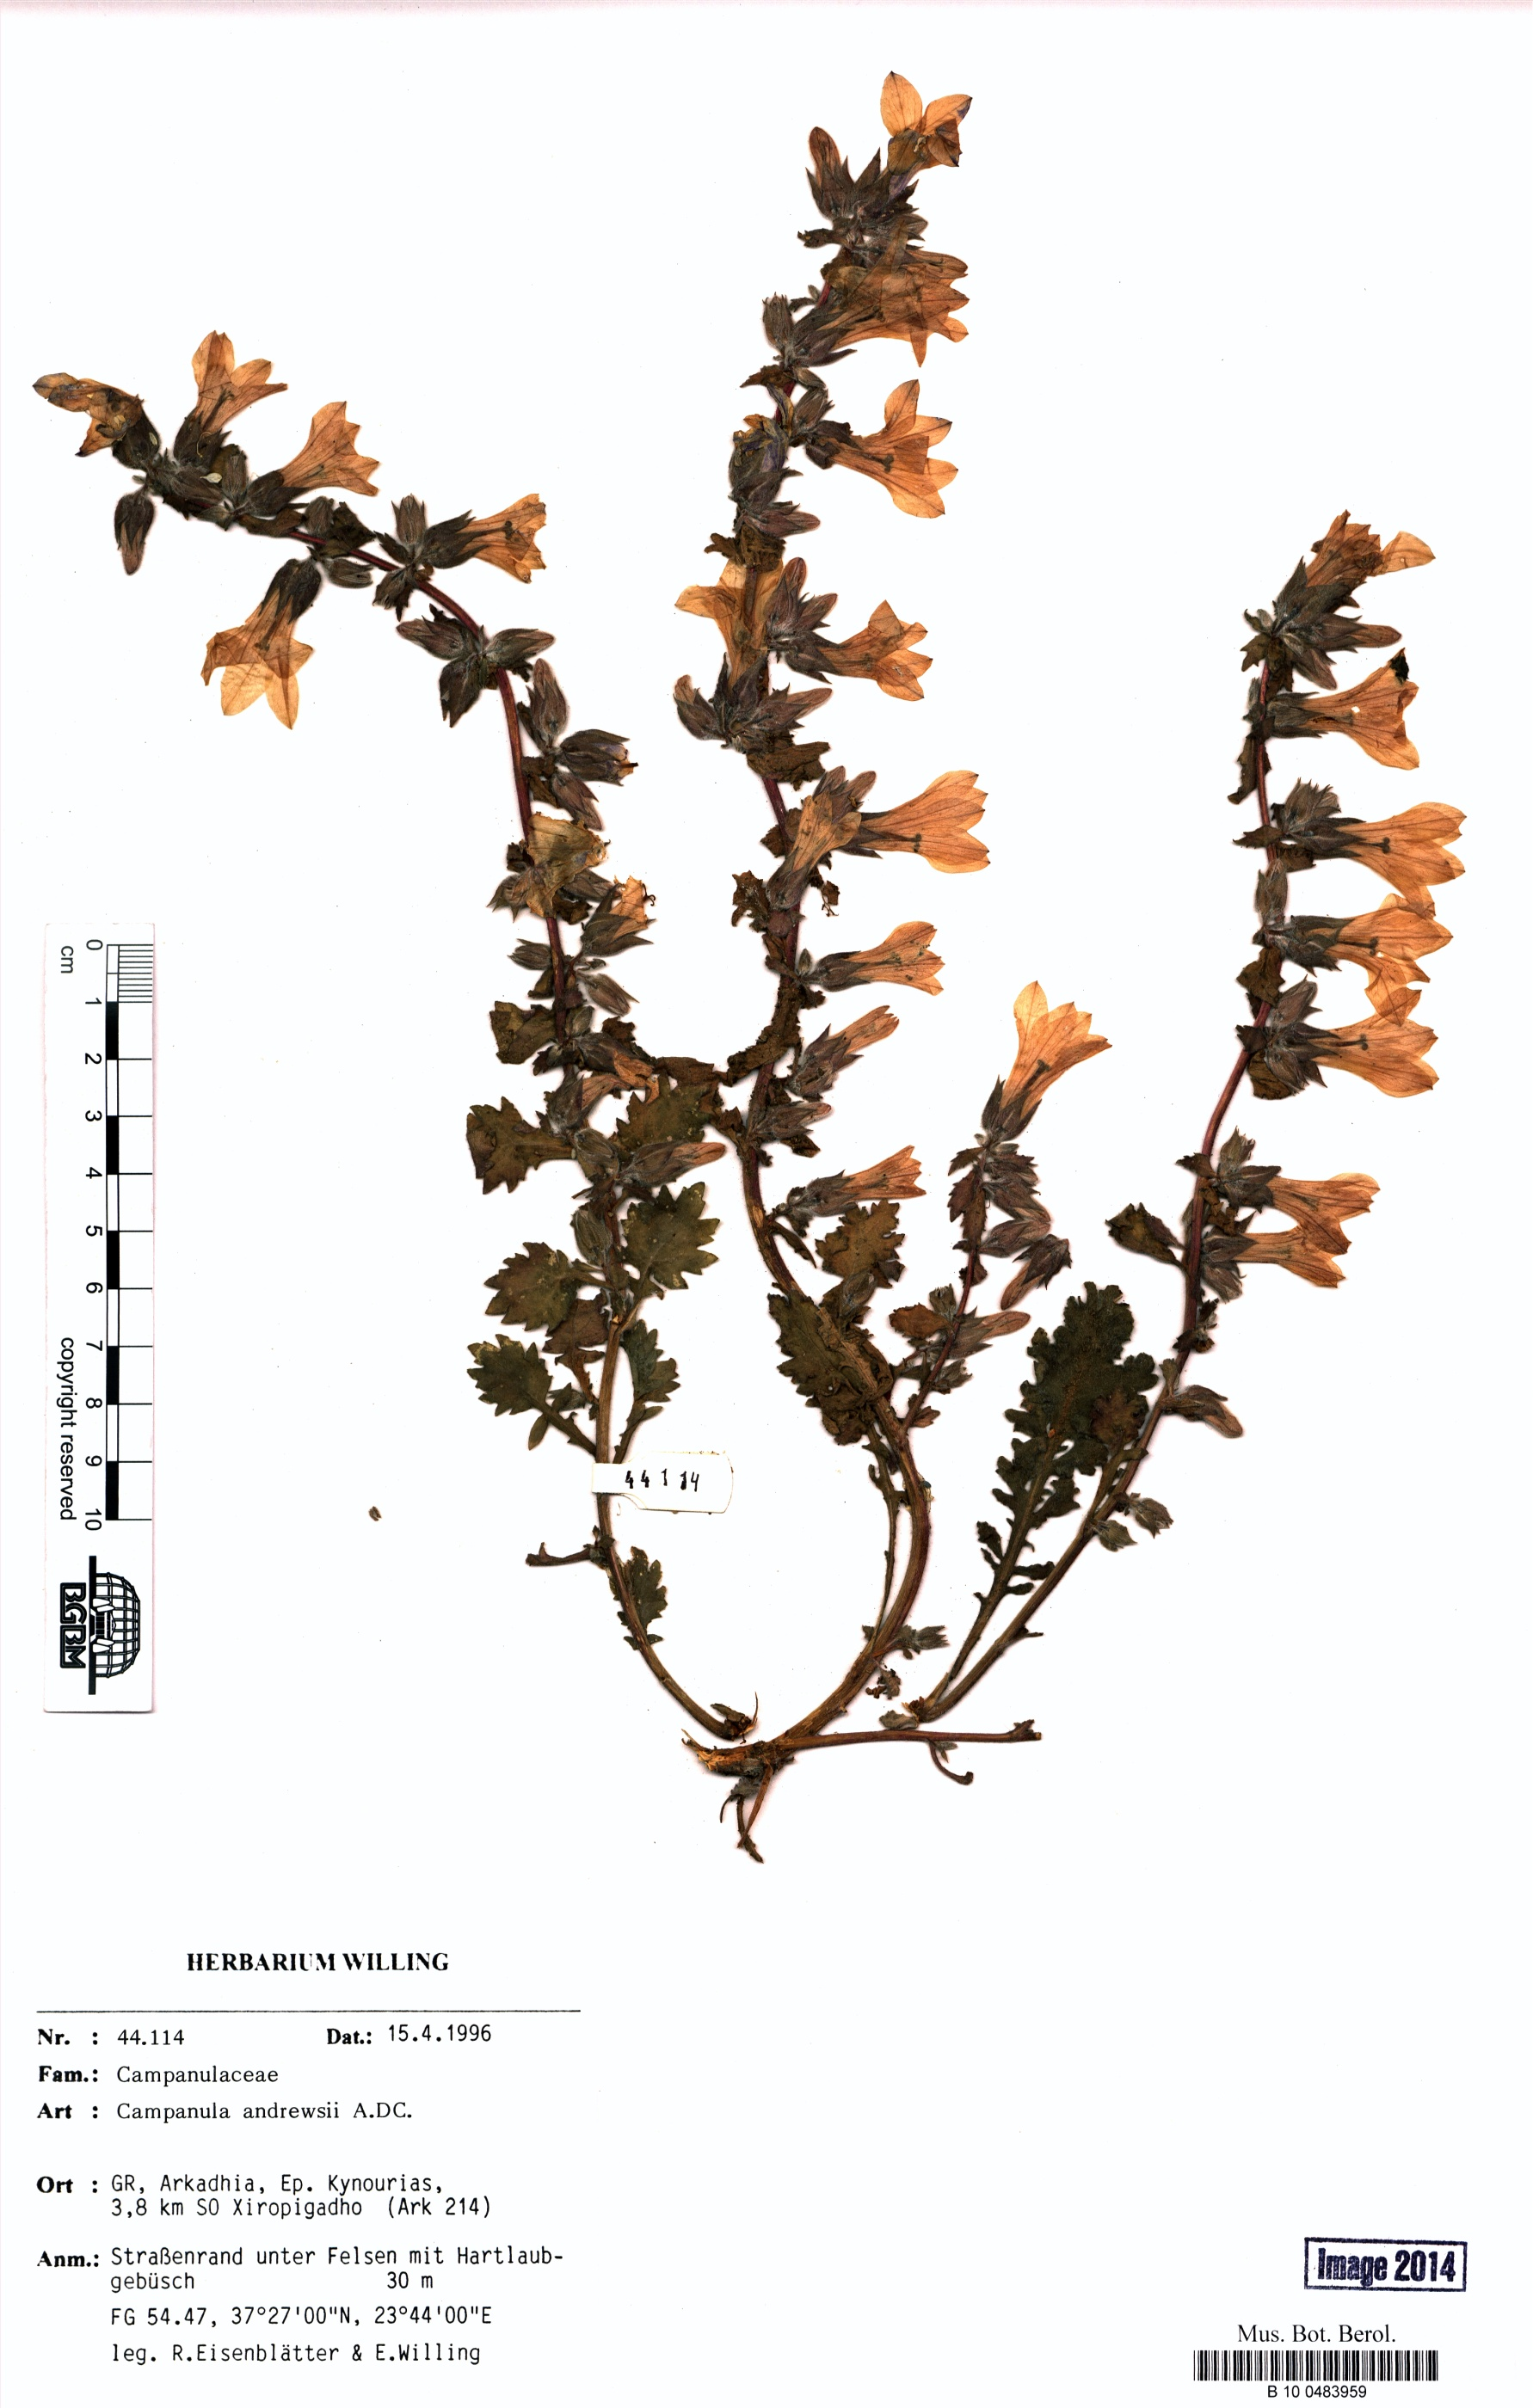 http://ww2.bgbm.org/herbarium/images/B/10/04/83/95/B_10_0483959.jpg